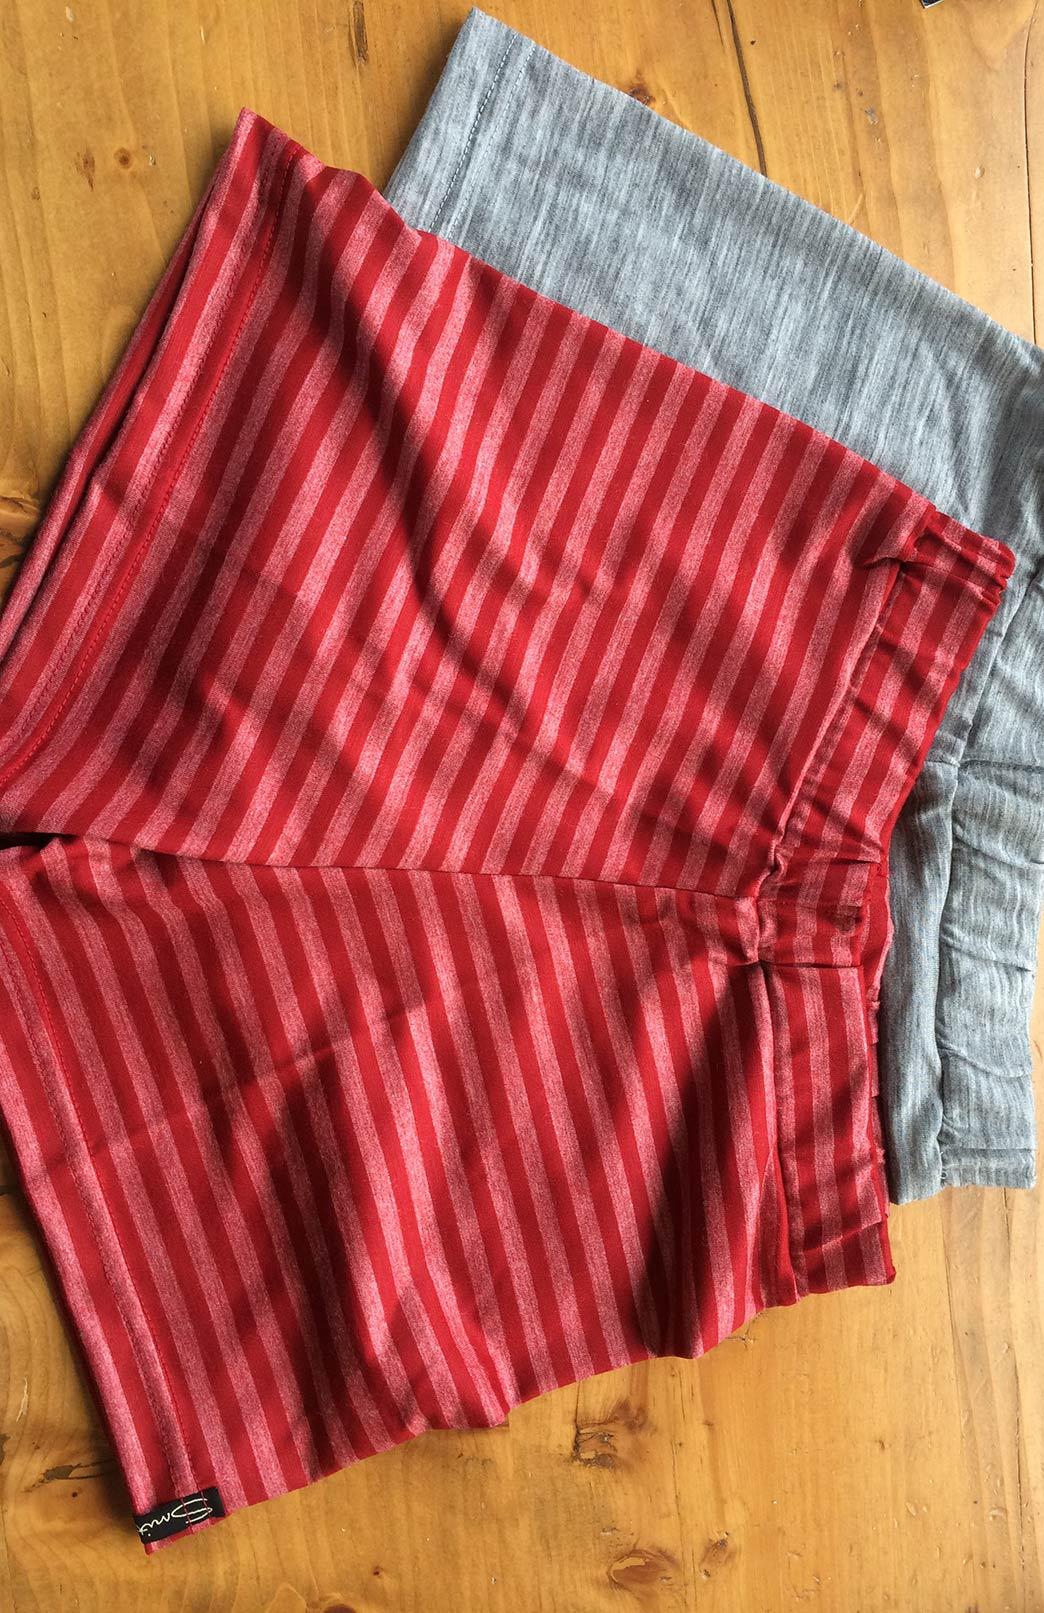 Women's Boxer Shorts - Smitten Merino Tasmania Australia